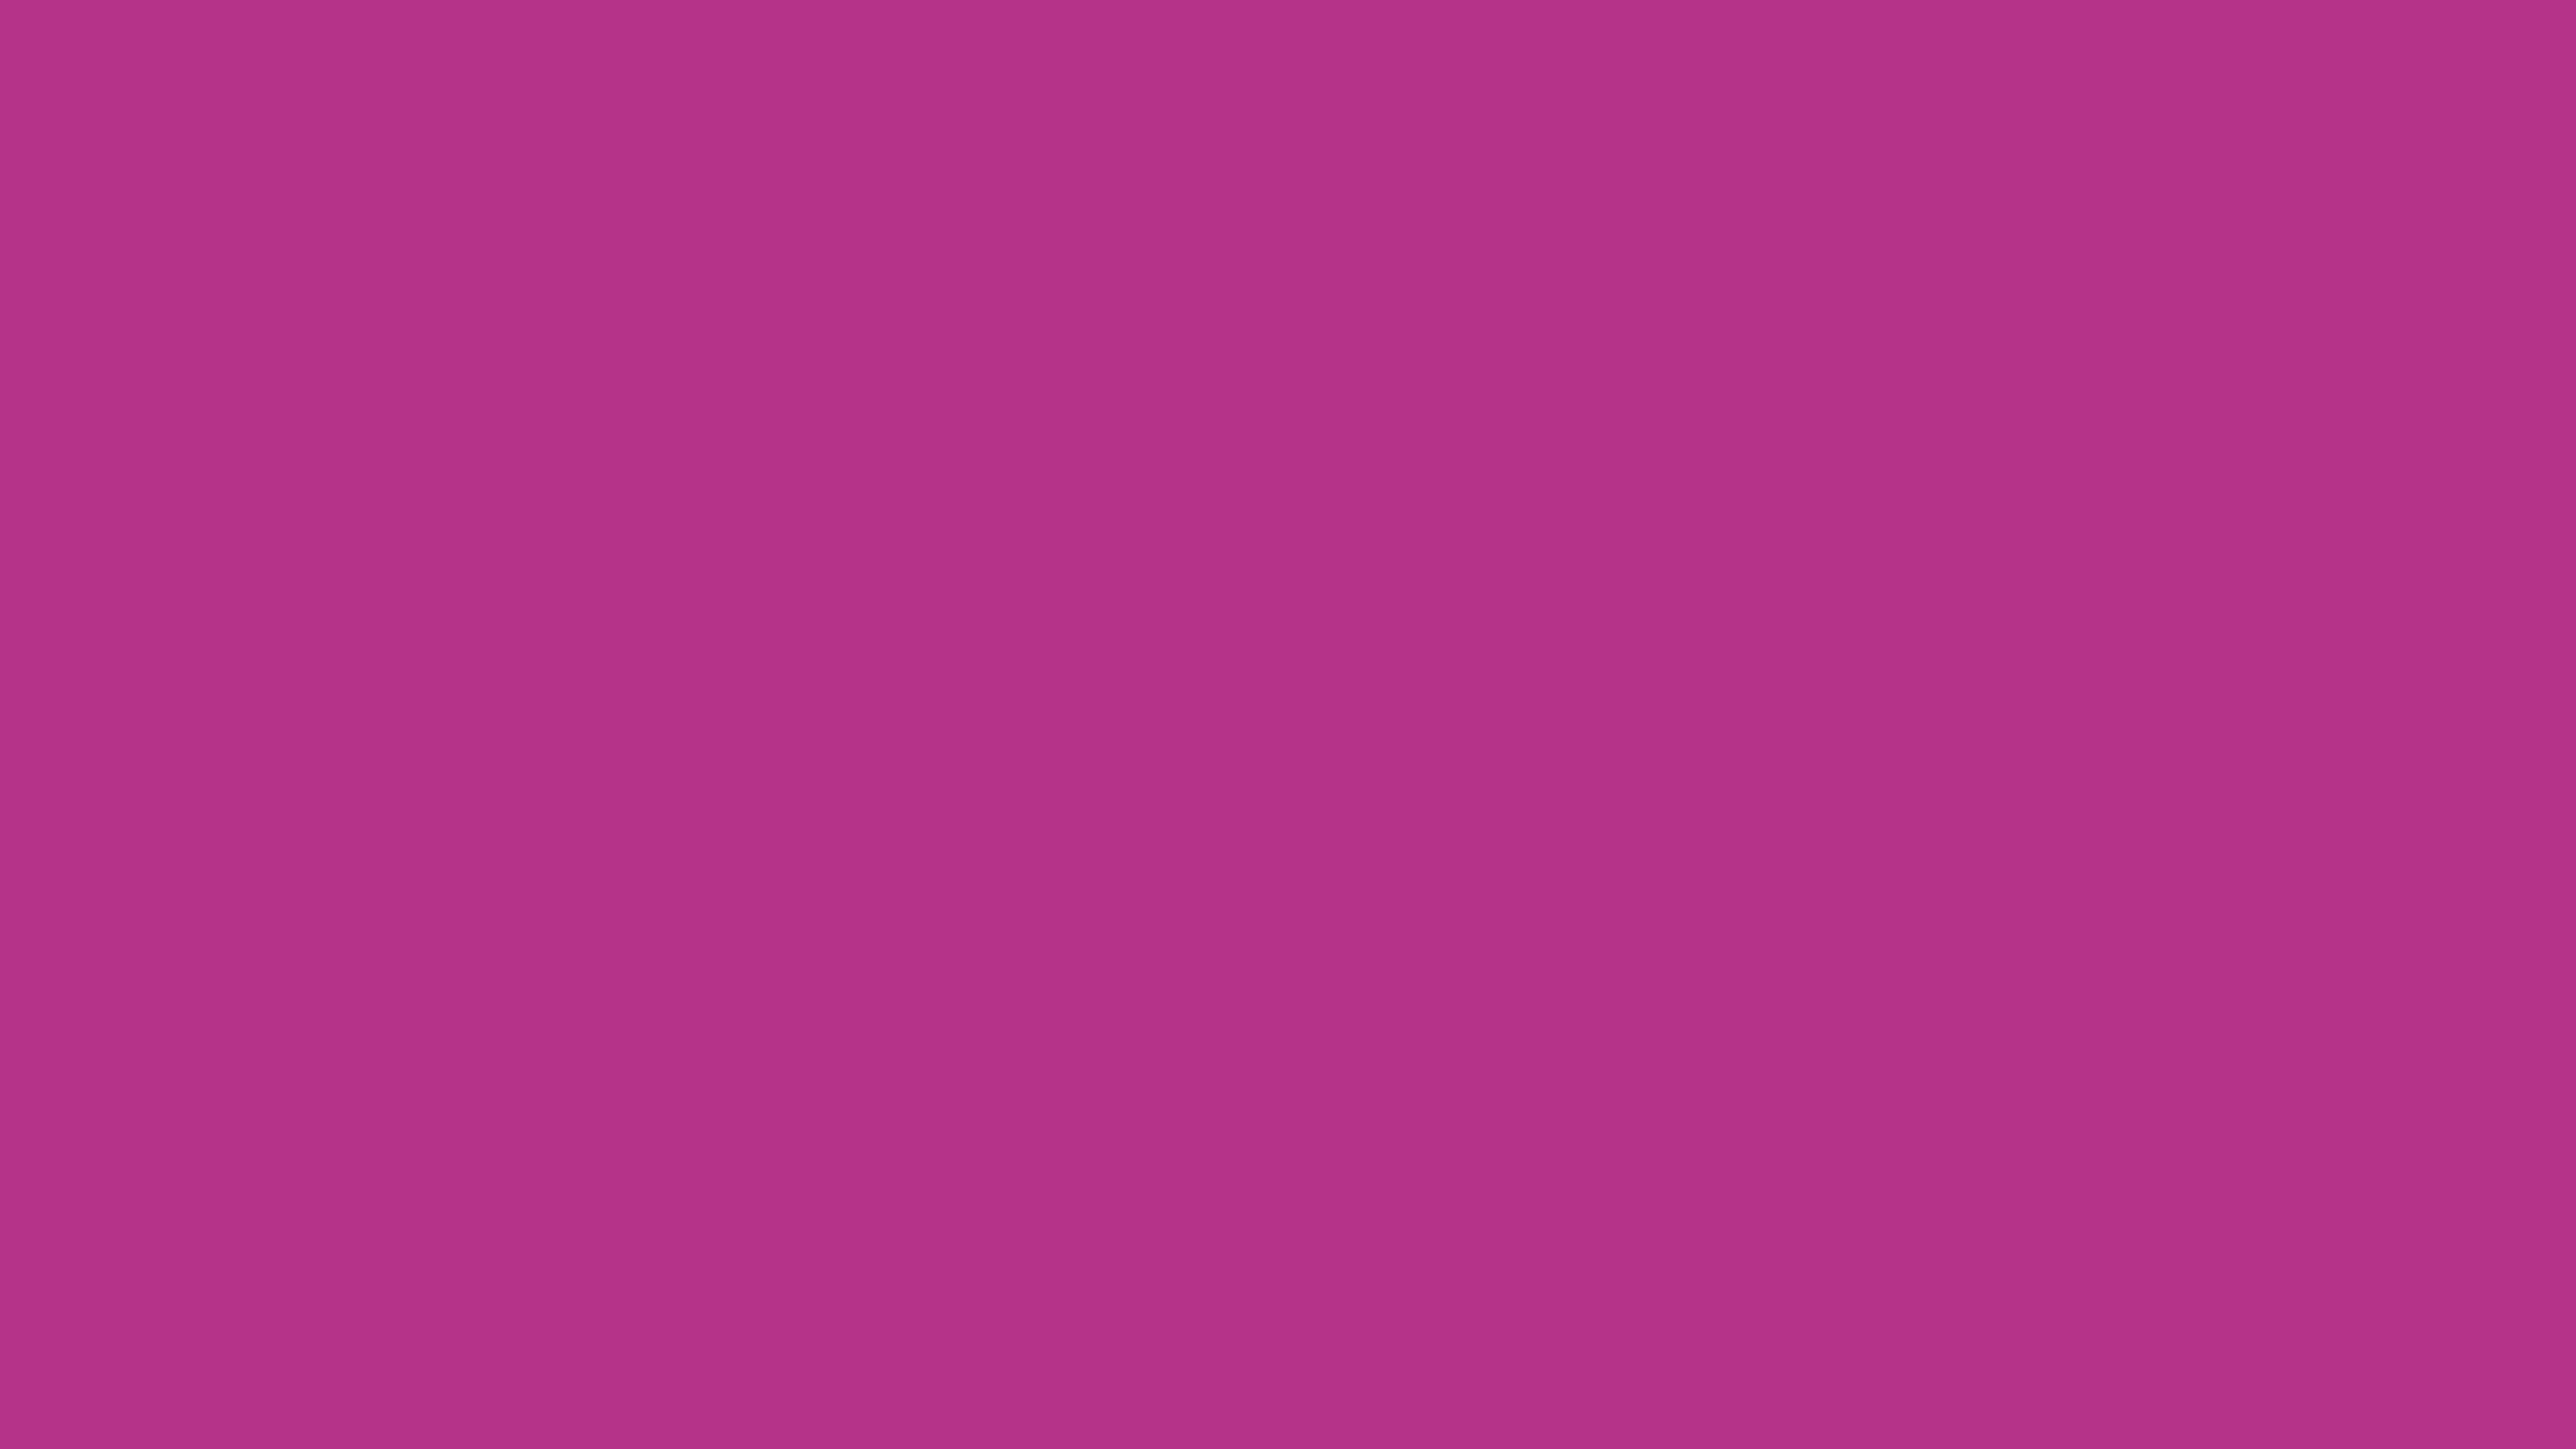 4096x2304 Fandango Solid Color Background